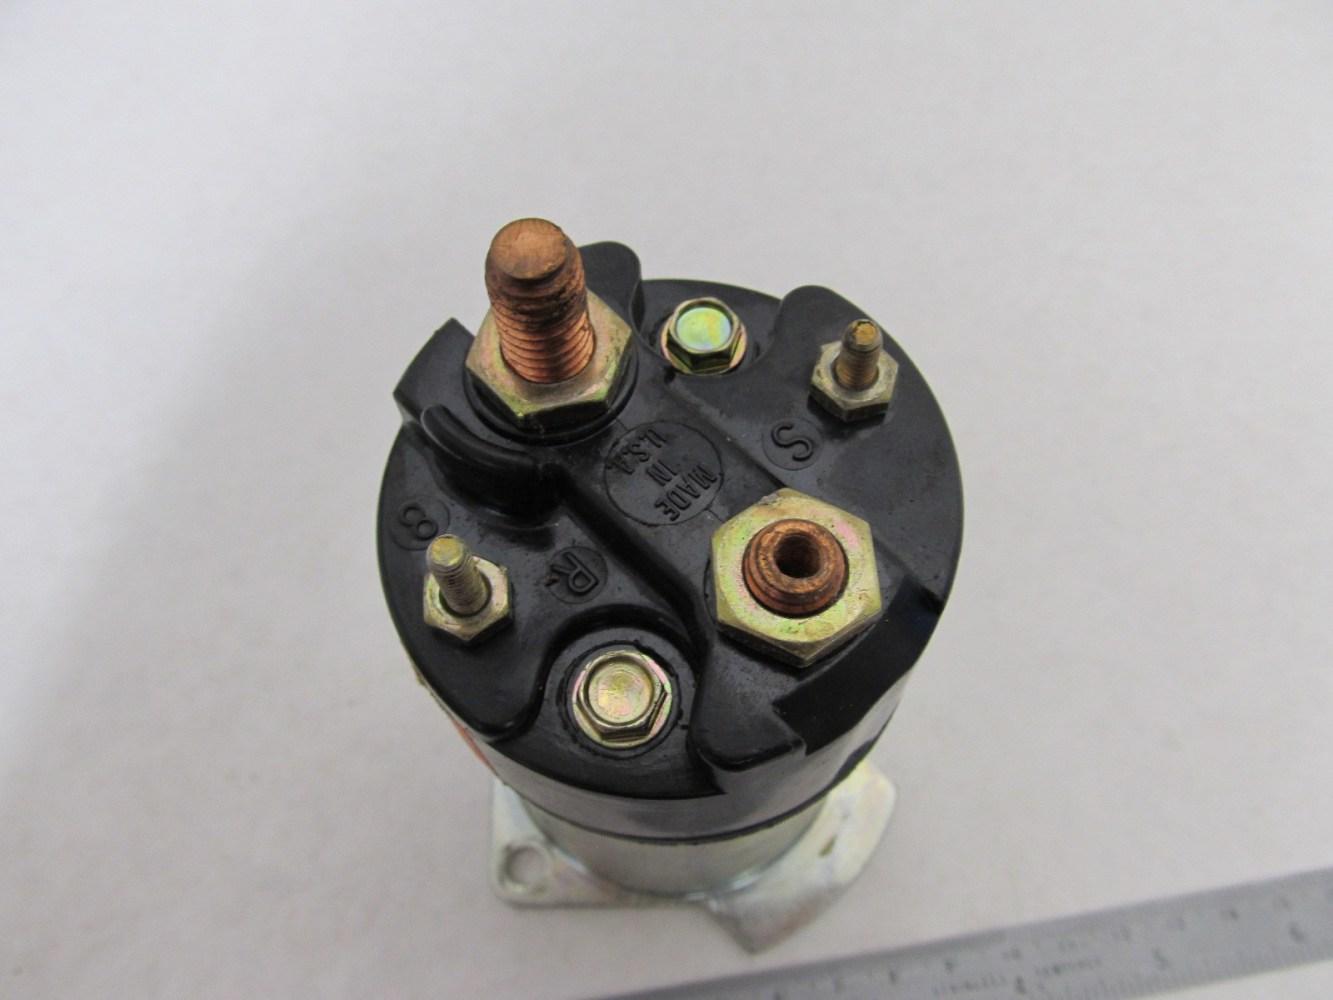 medium resolution of 1998 bayliner capri ignition switch wiring diagram 1996 crownline 182 br wiring diagram mercury boat